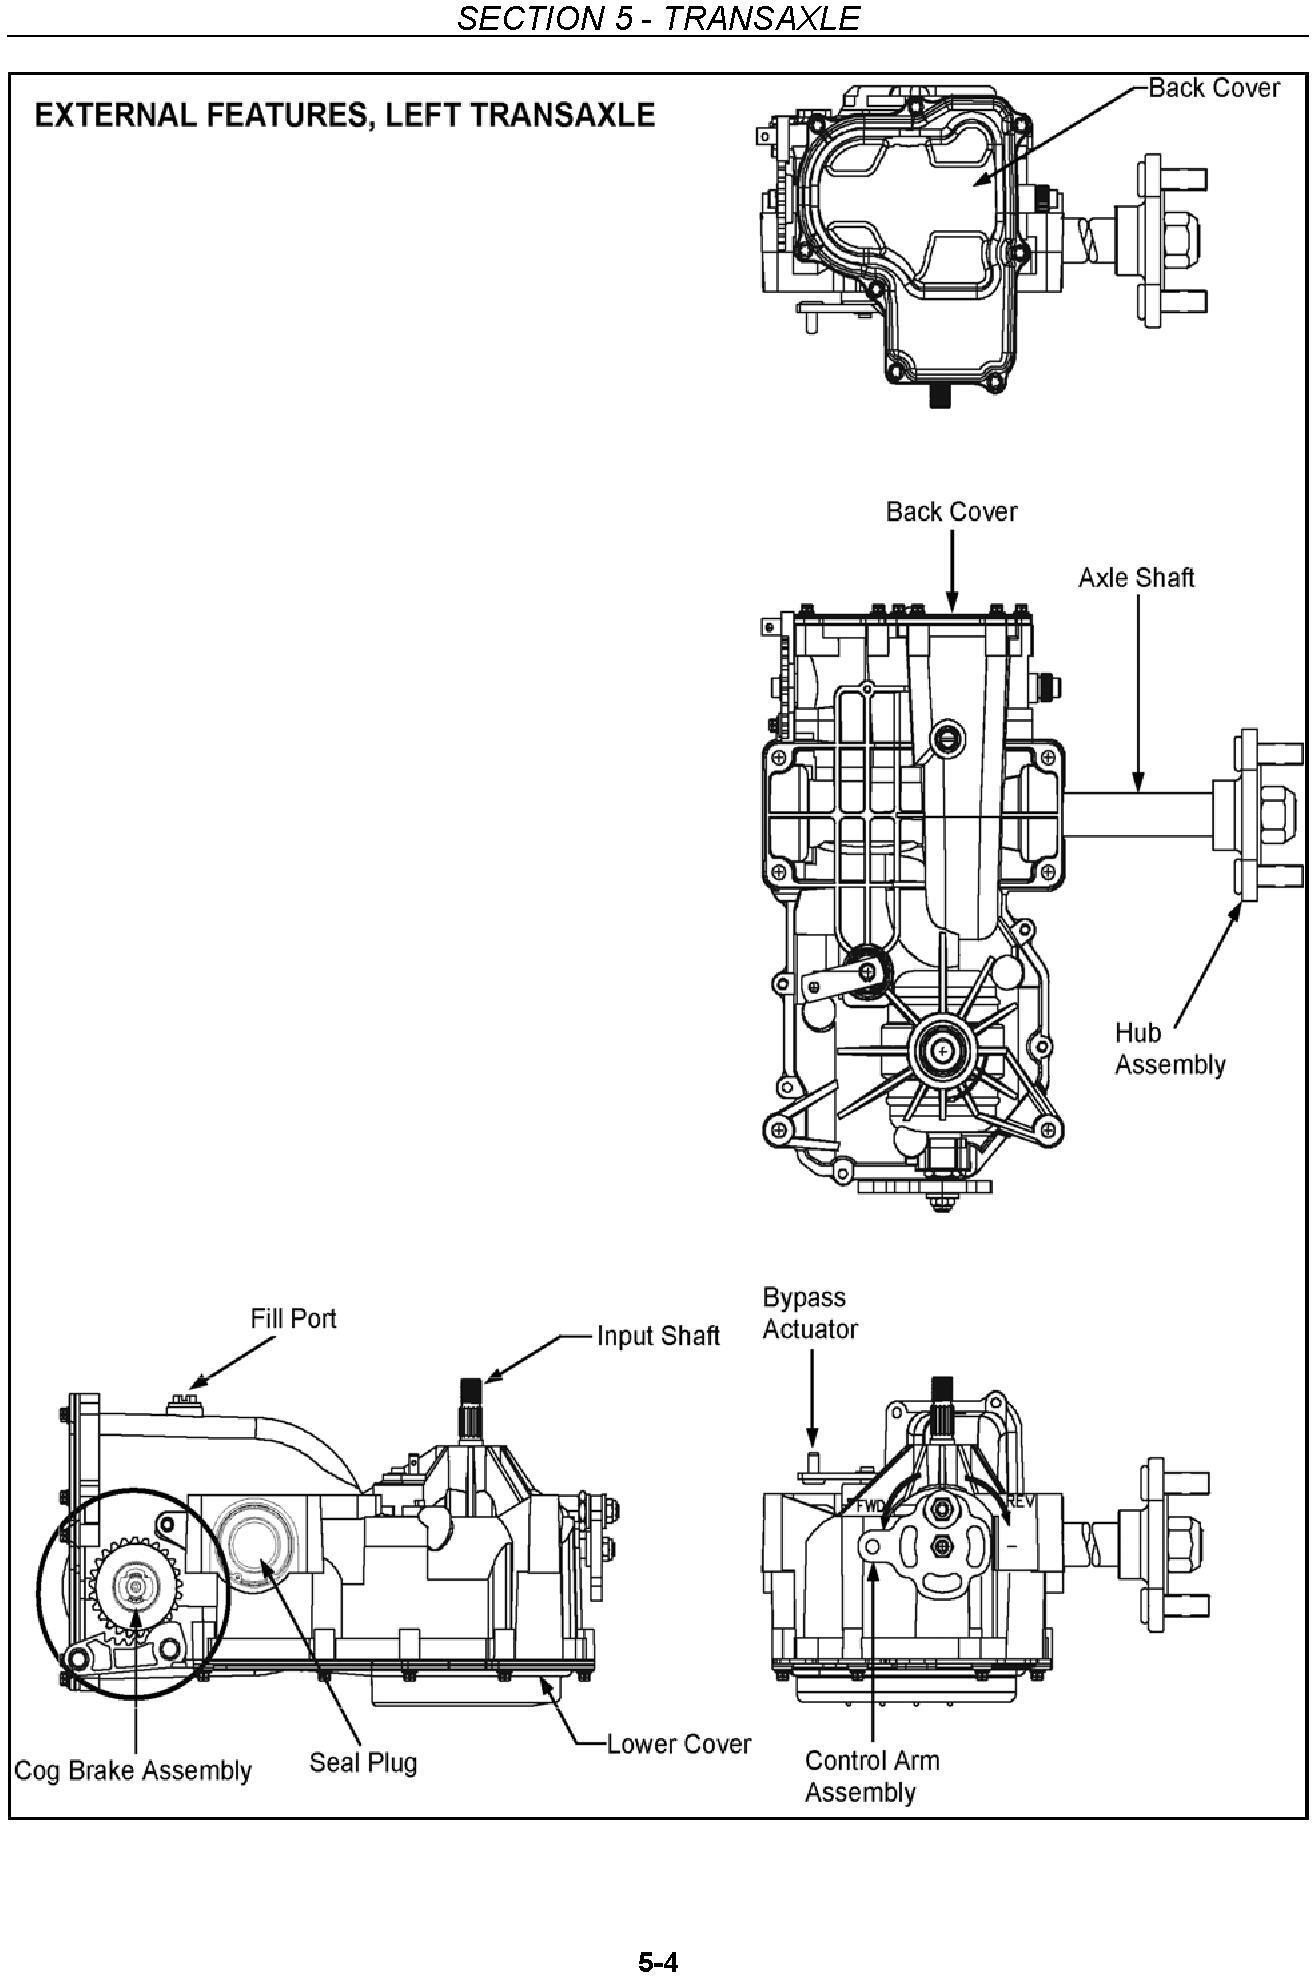 New Holland MZ19H Zero Turn Radious Mower Service Manual - 2